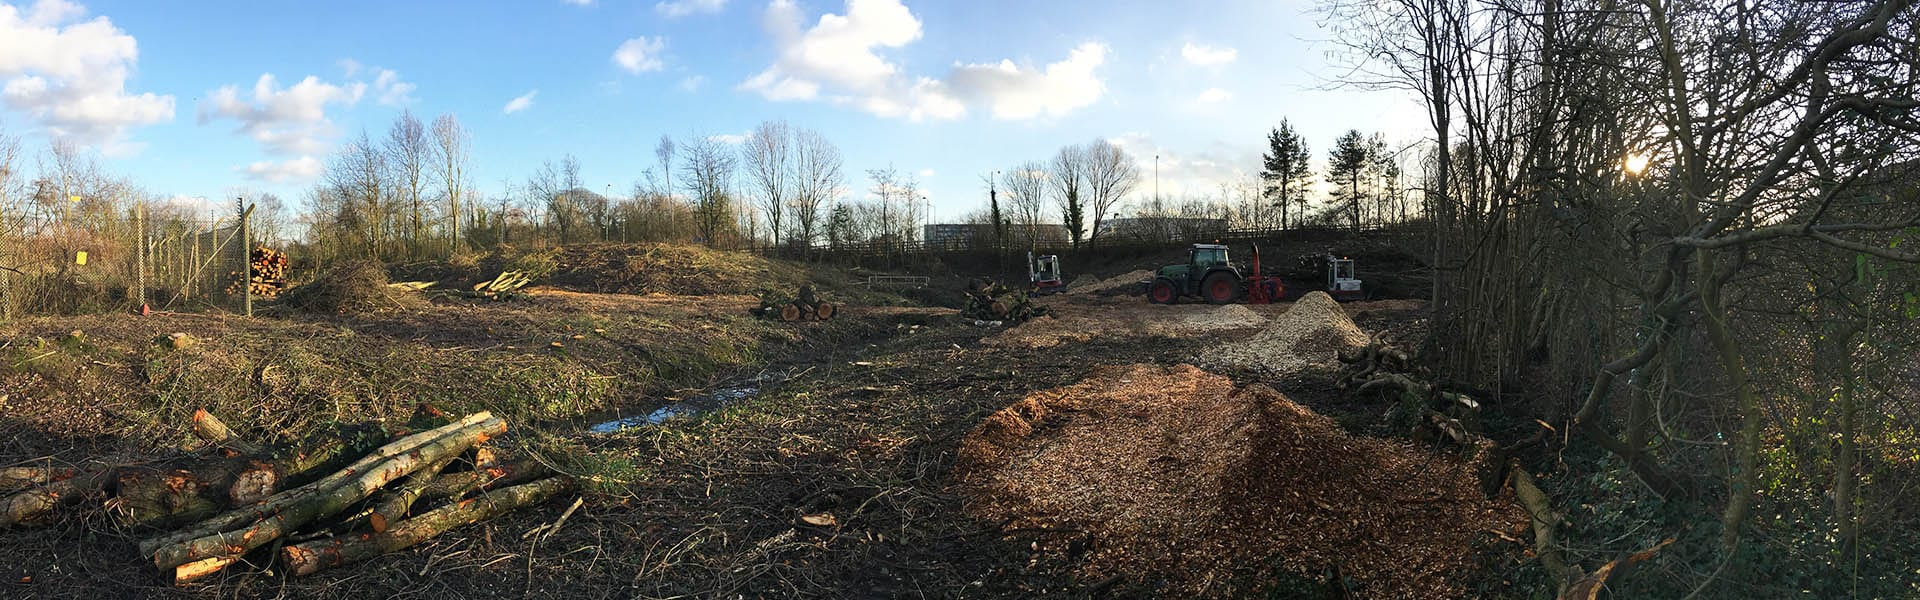 Wainwright UK Site Clearance